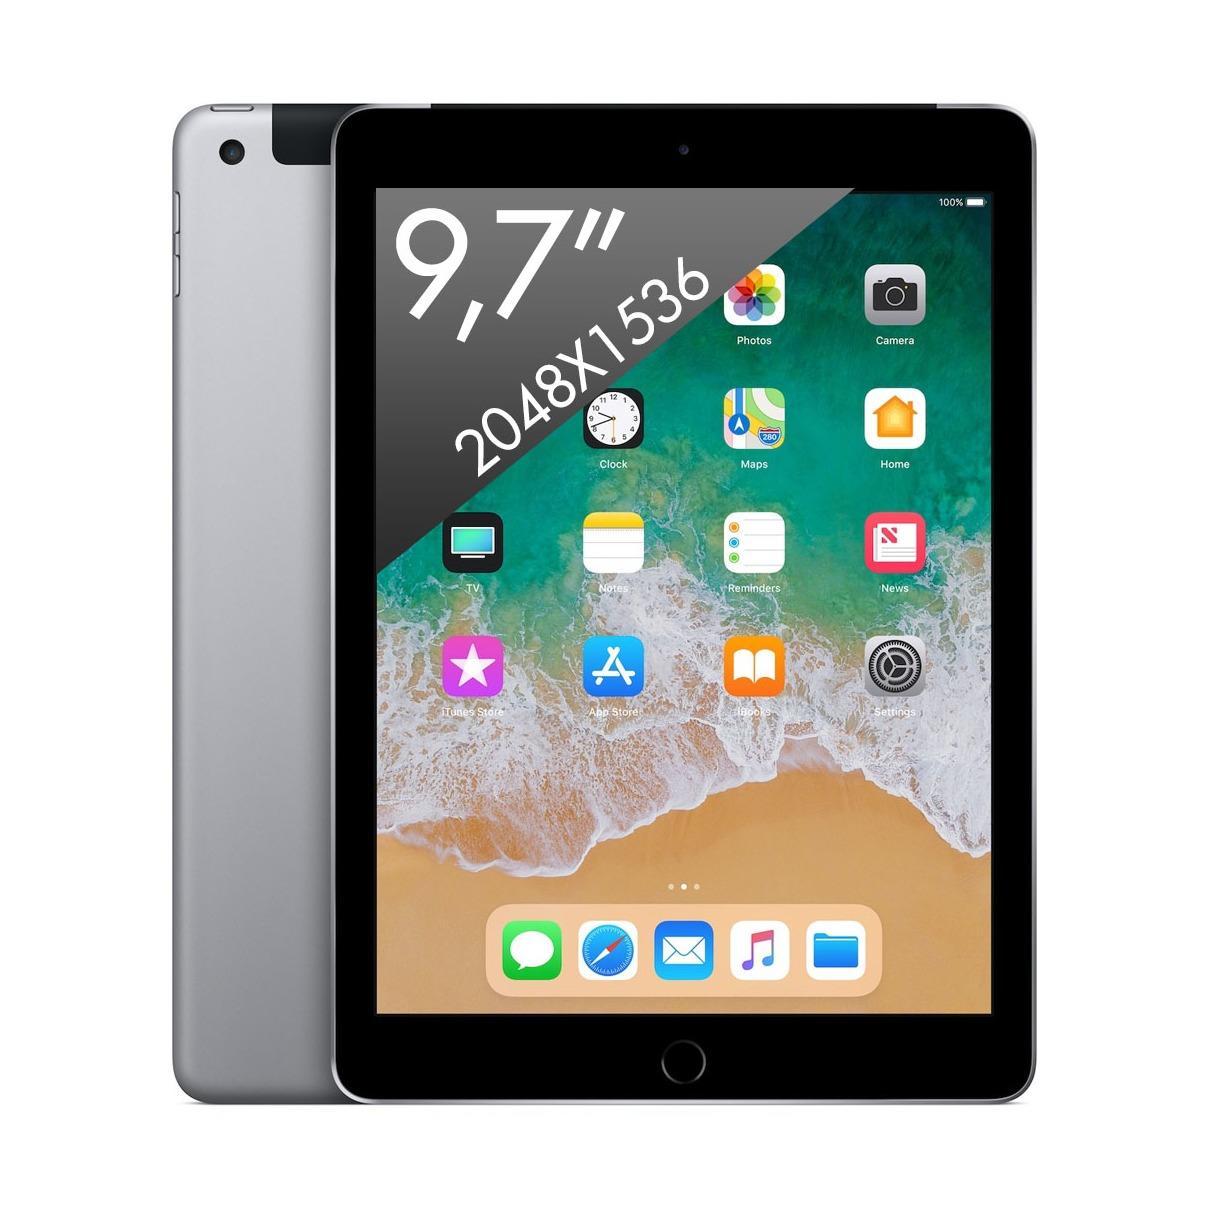 Apple iPad 32GB (Wi-Fi) Spacegrijs (2018)